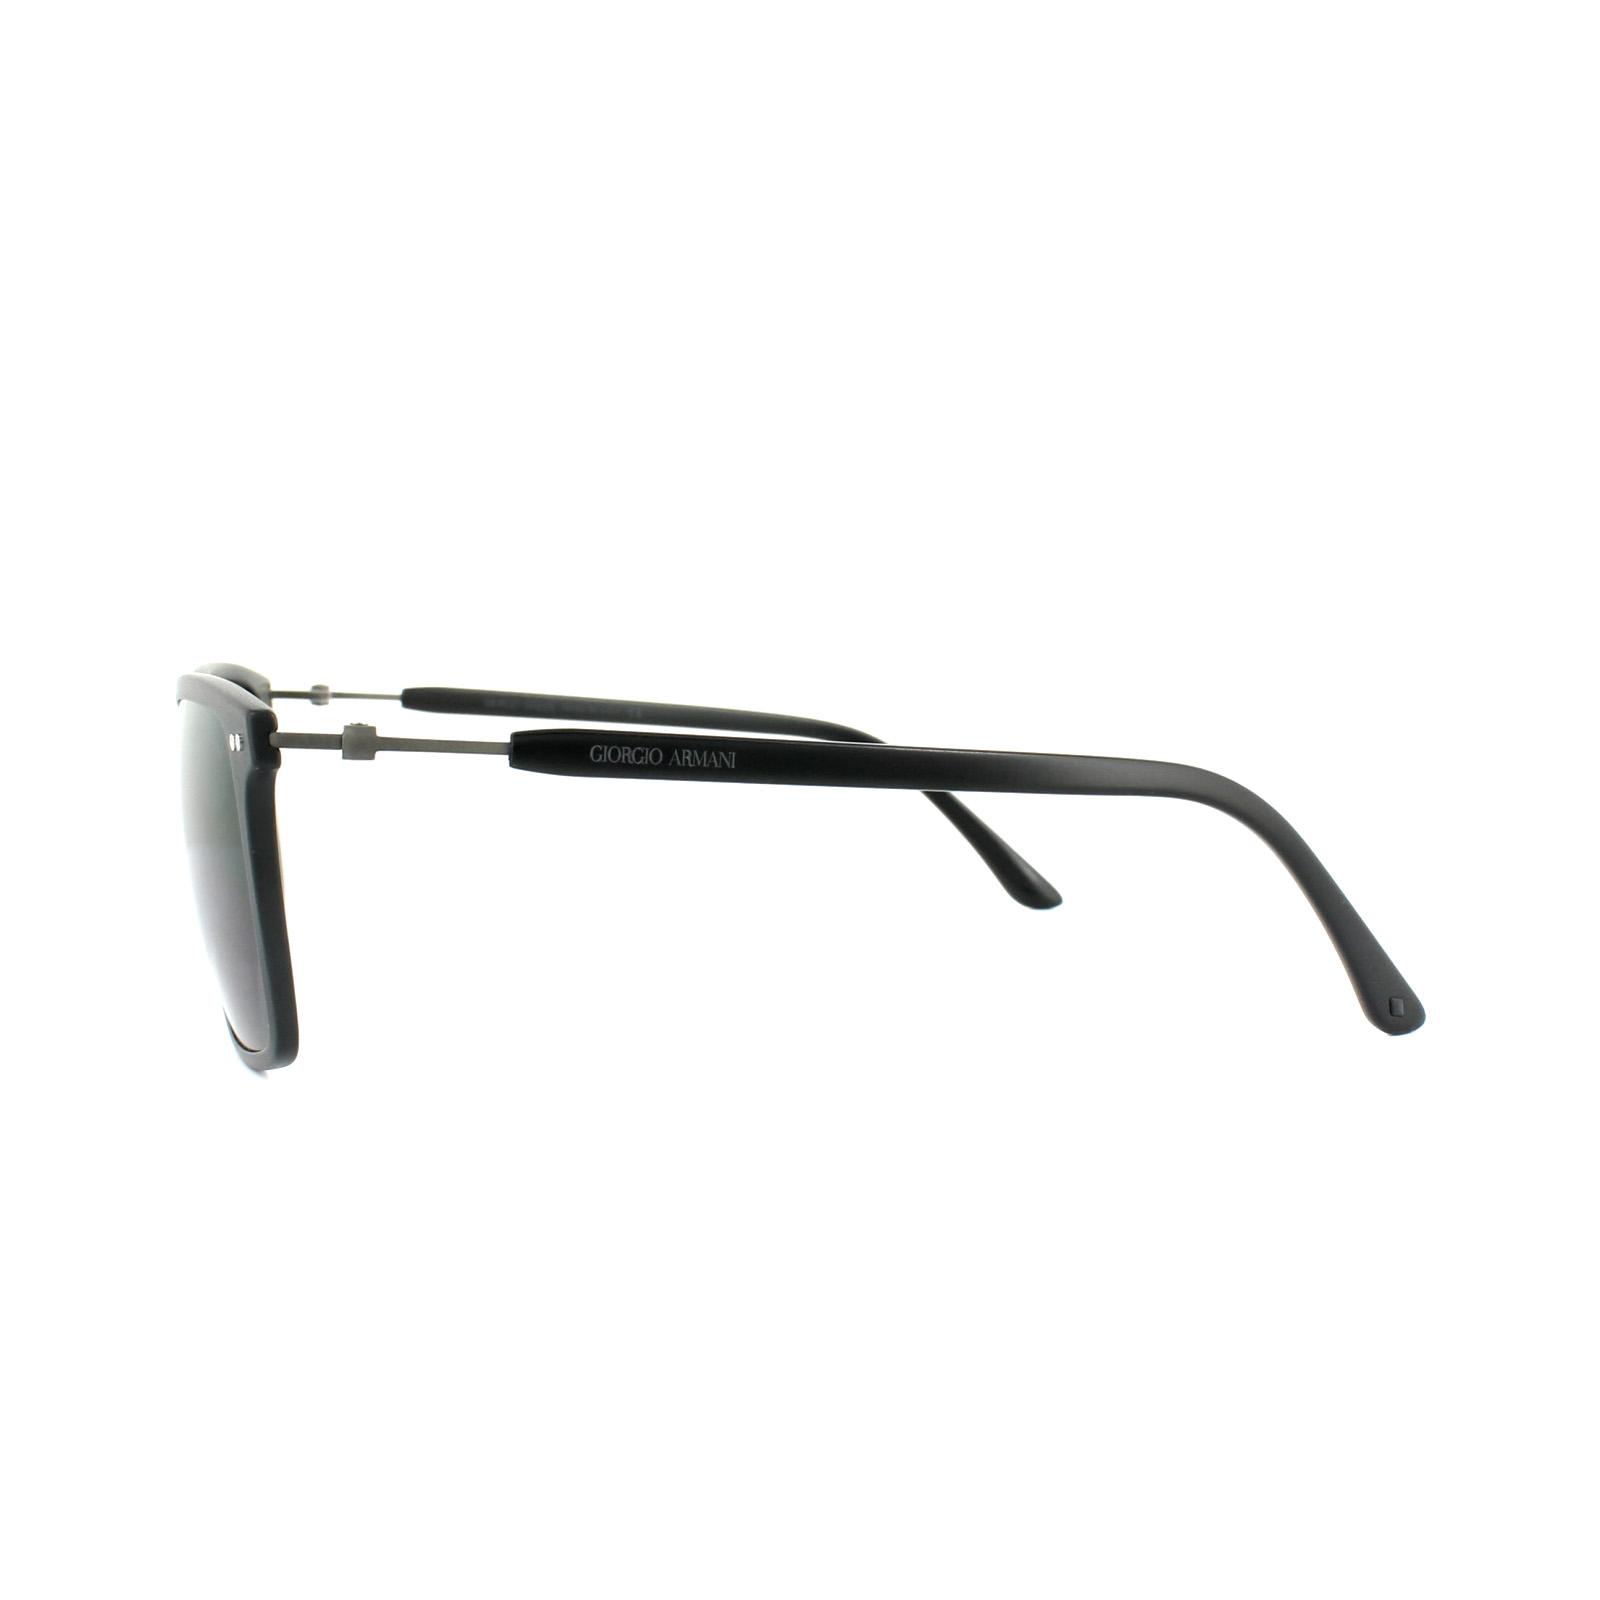 0477130917cd Sentinel Thumbnail 2. Sentinel Giorgio Armani Sunglasses AR8045 504287 Matt  Black Grey. Sentinel Thumbnail 3